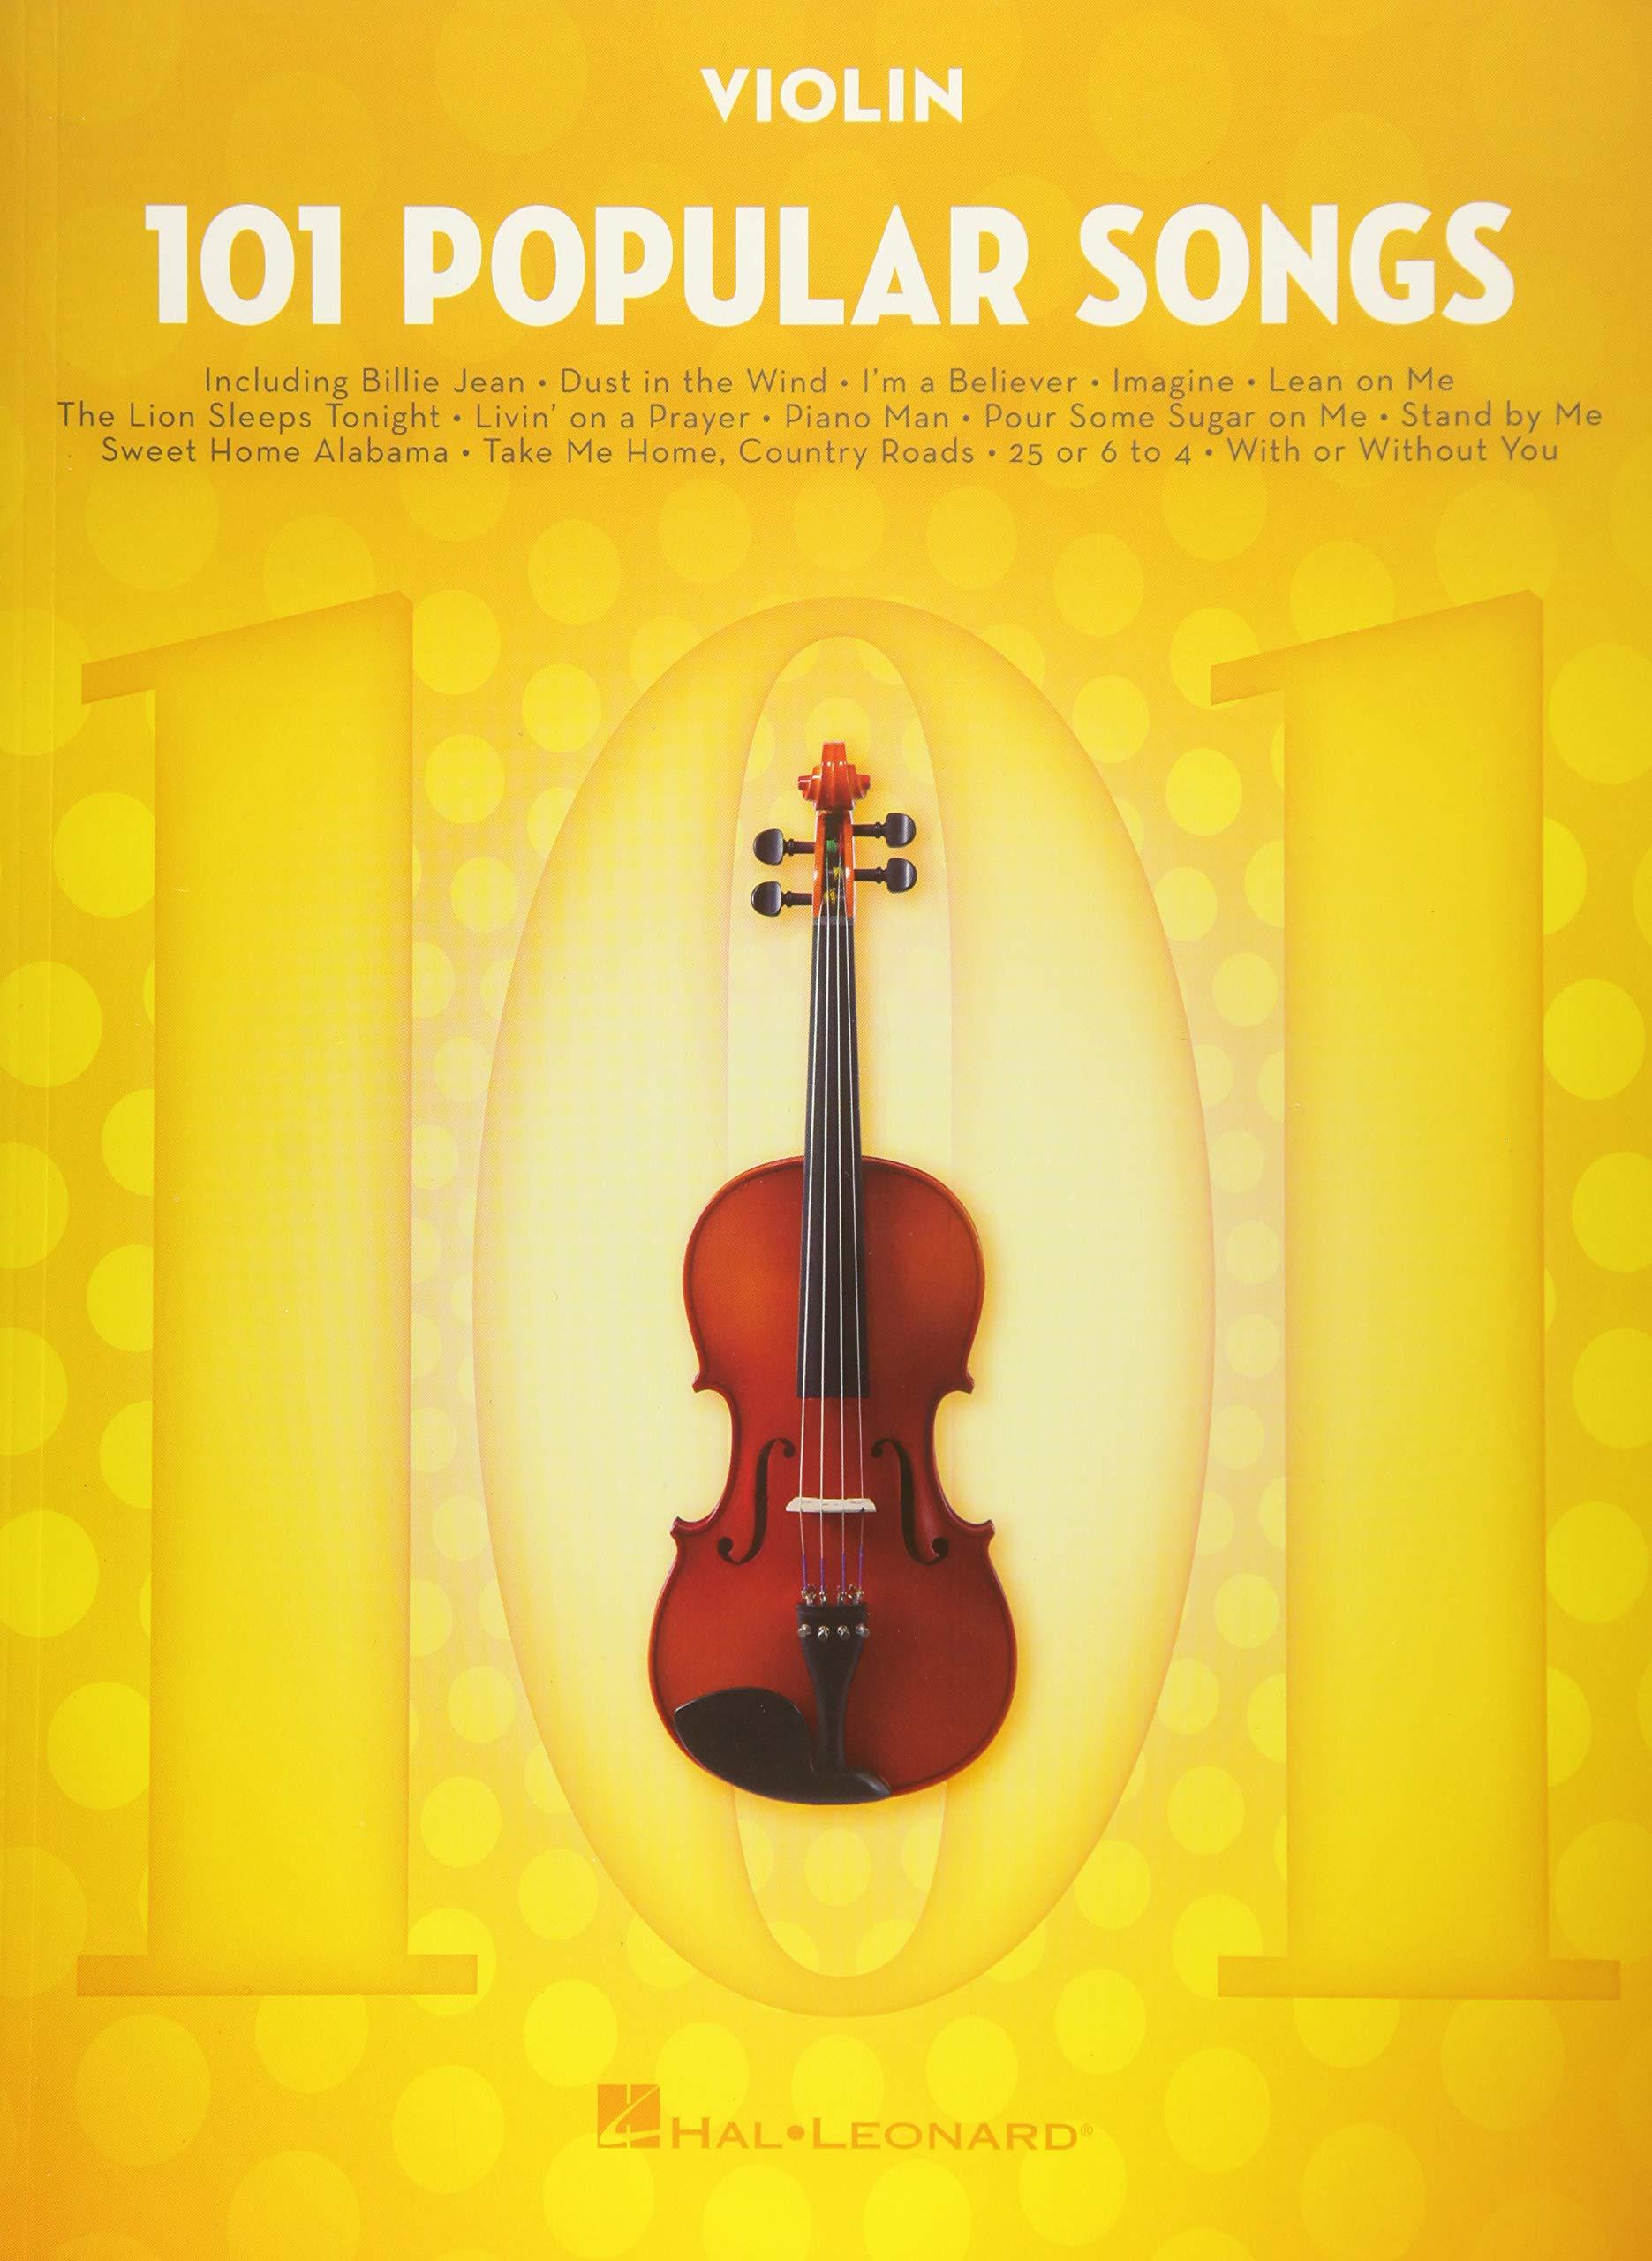 Amazon com: 101 Popular Songs: for Violin (9781495090301): Hal